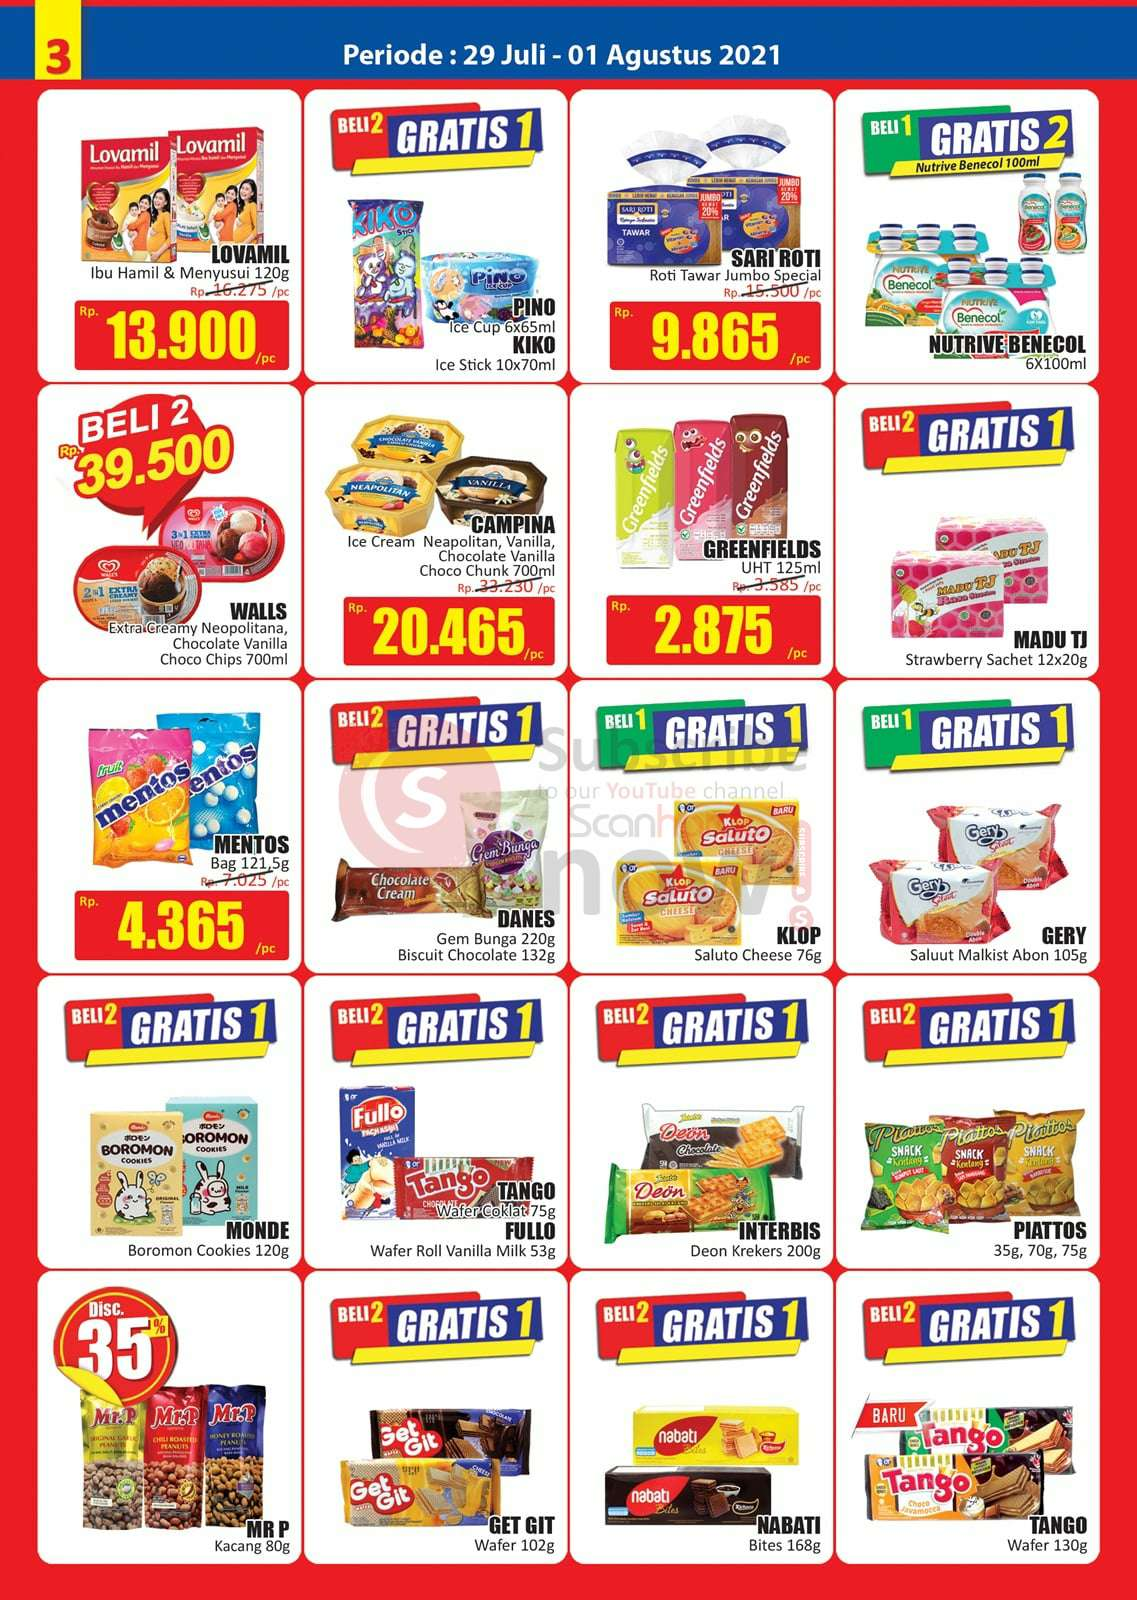 Katalog Promo JSM Hari Hari Swalayan Weekend 29 Juli - 1 Agustus 2021 3